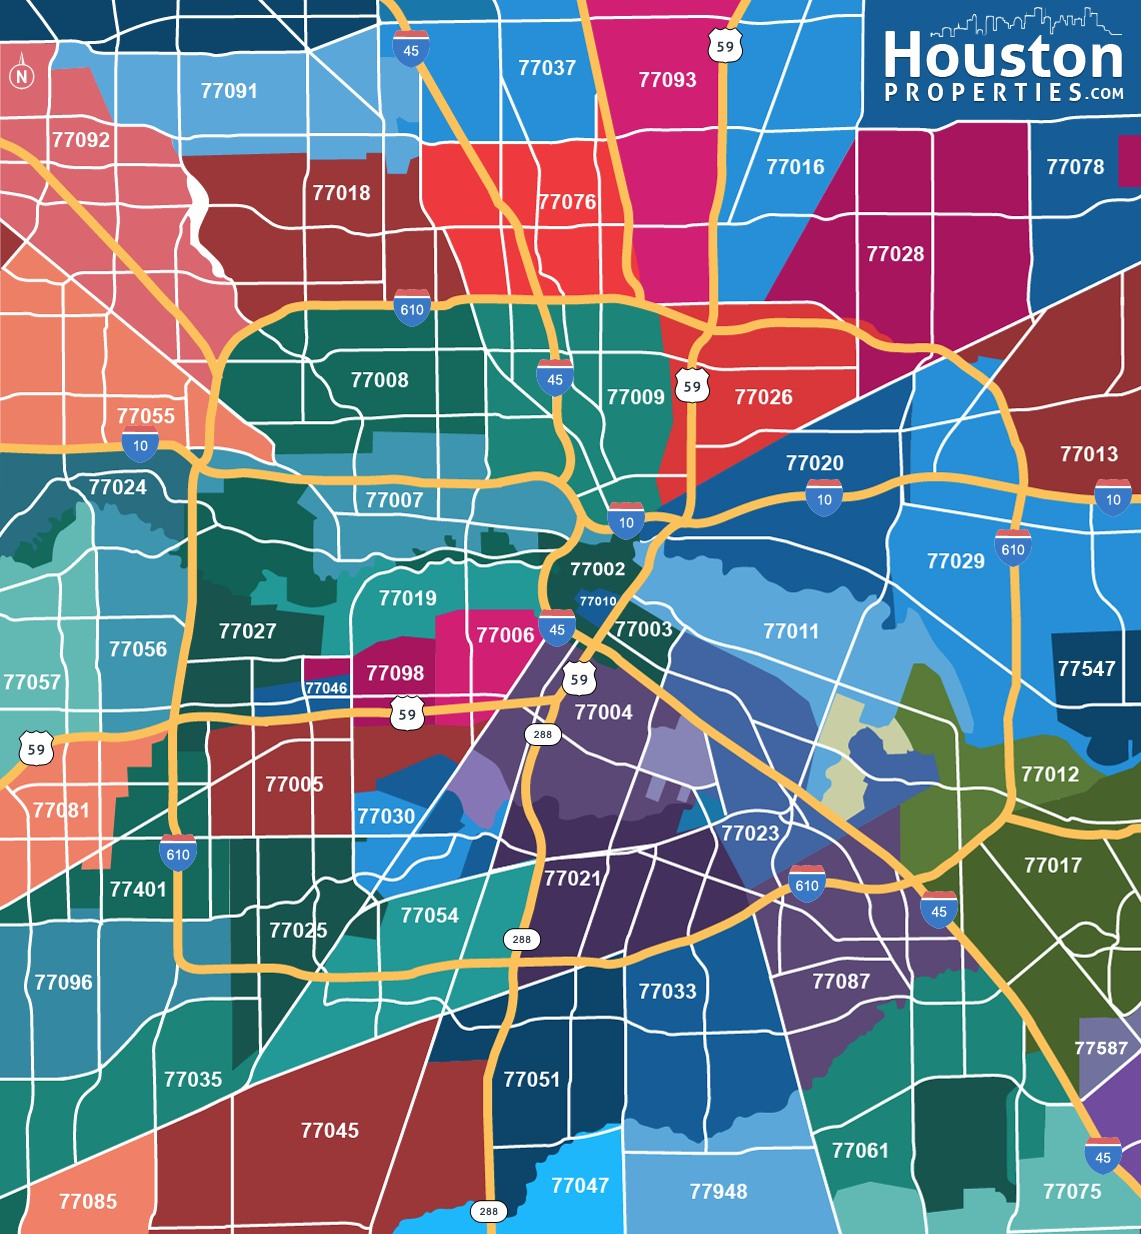 2019 Update: Houston Texas Zip Code Map | Houstonproperties - Map Of Northwest Houston Texas